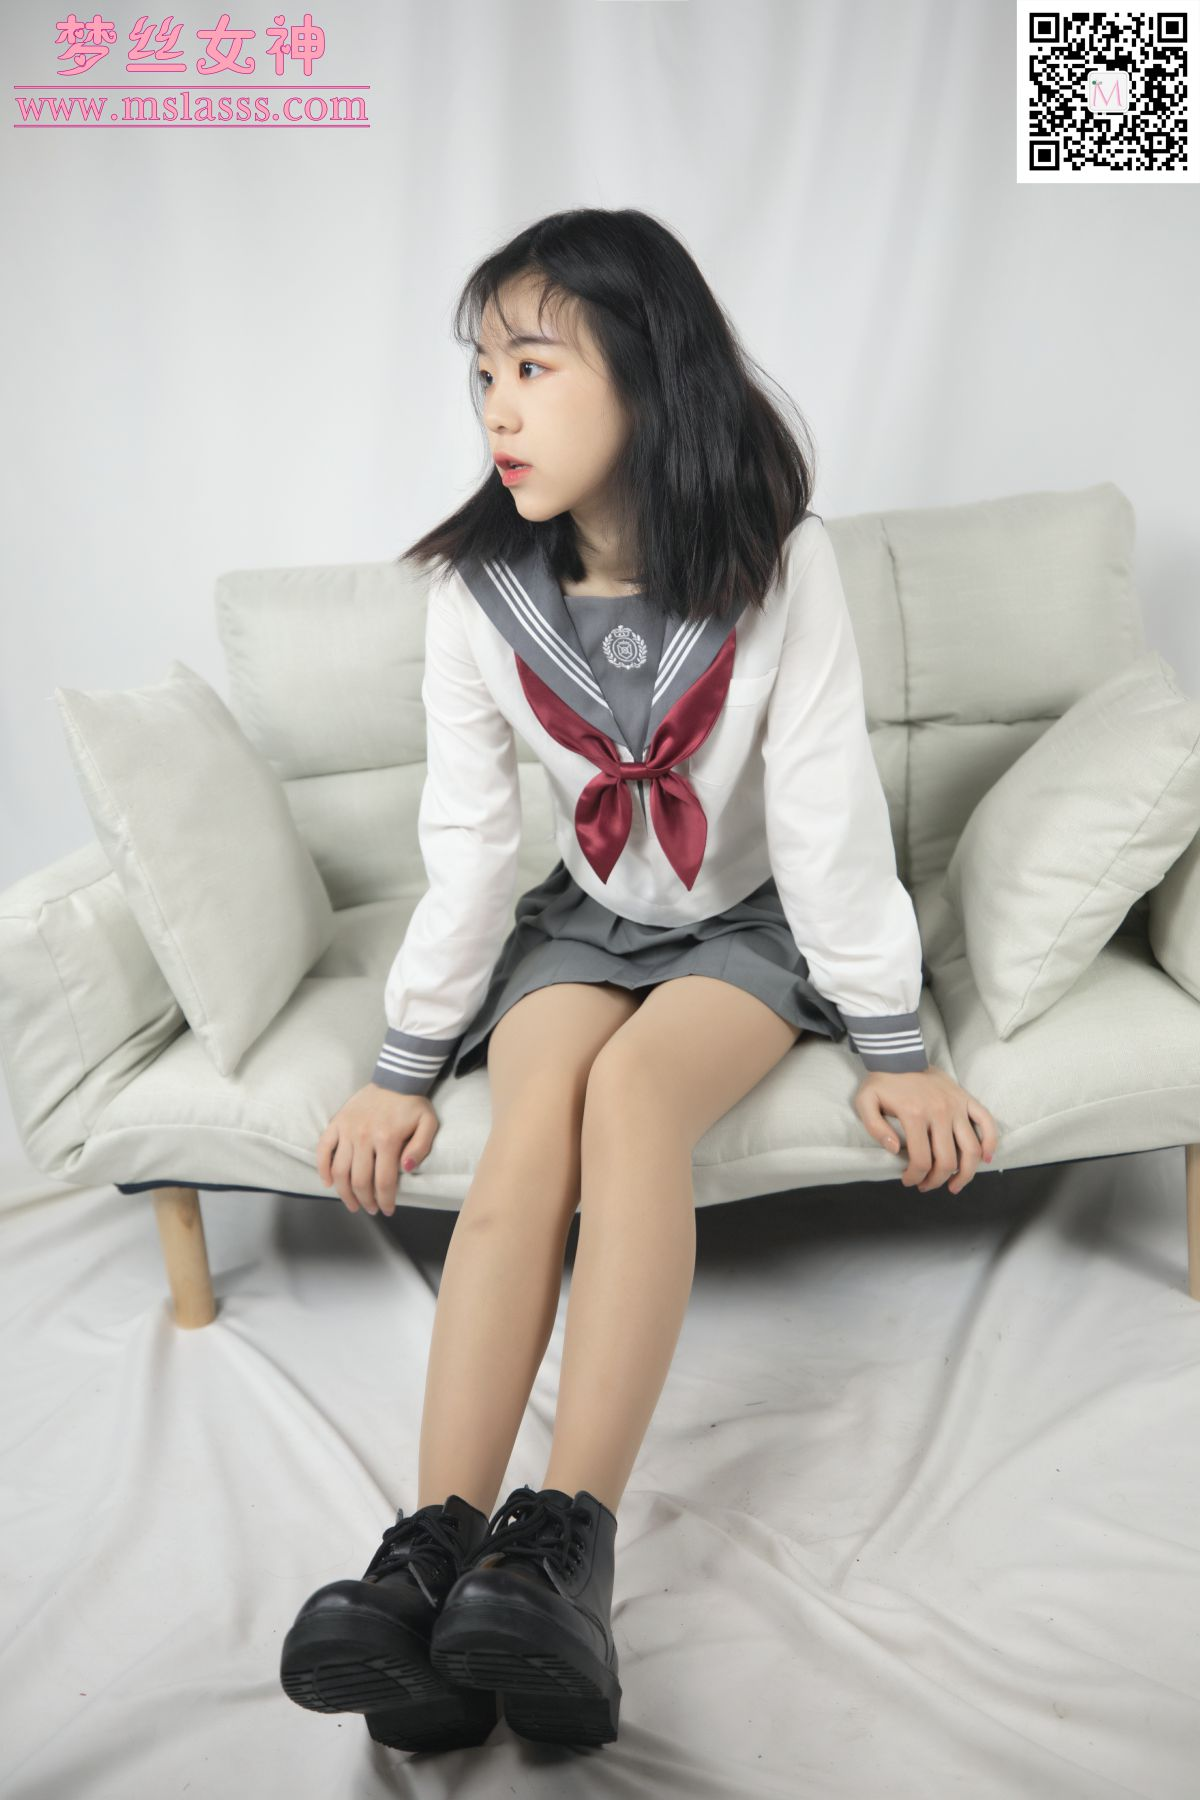 [MSLASS]梦丝女神 奶味小仙女 初恋的味道[73P] 梦丝女神 第4张